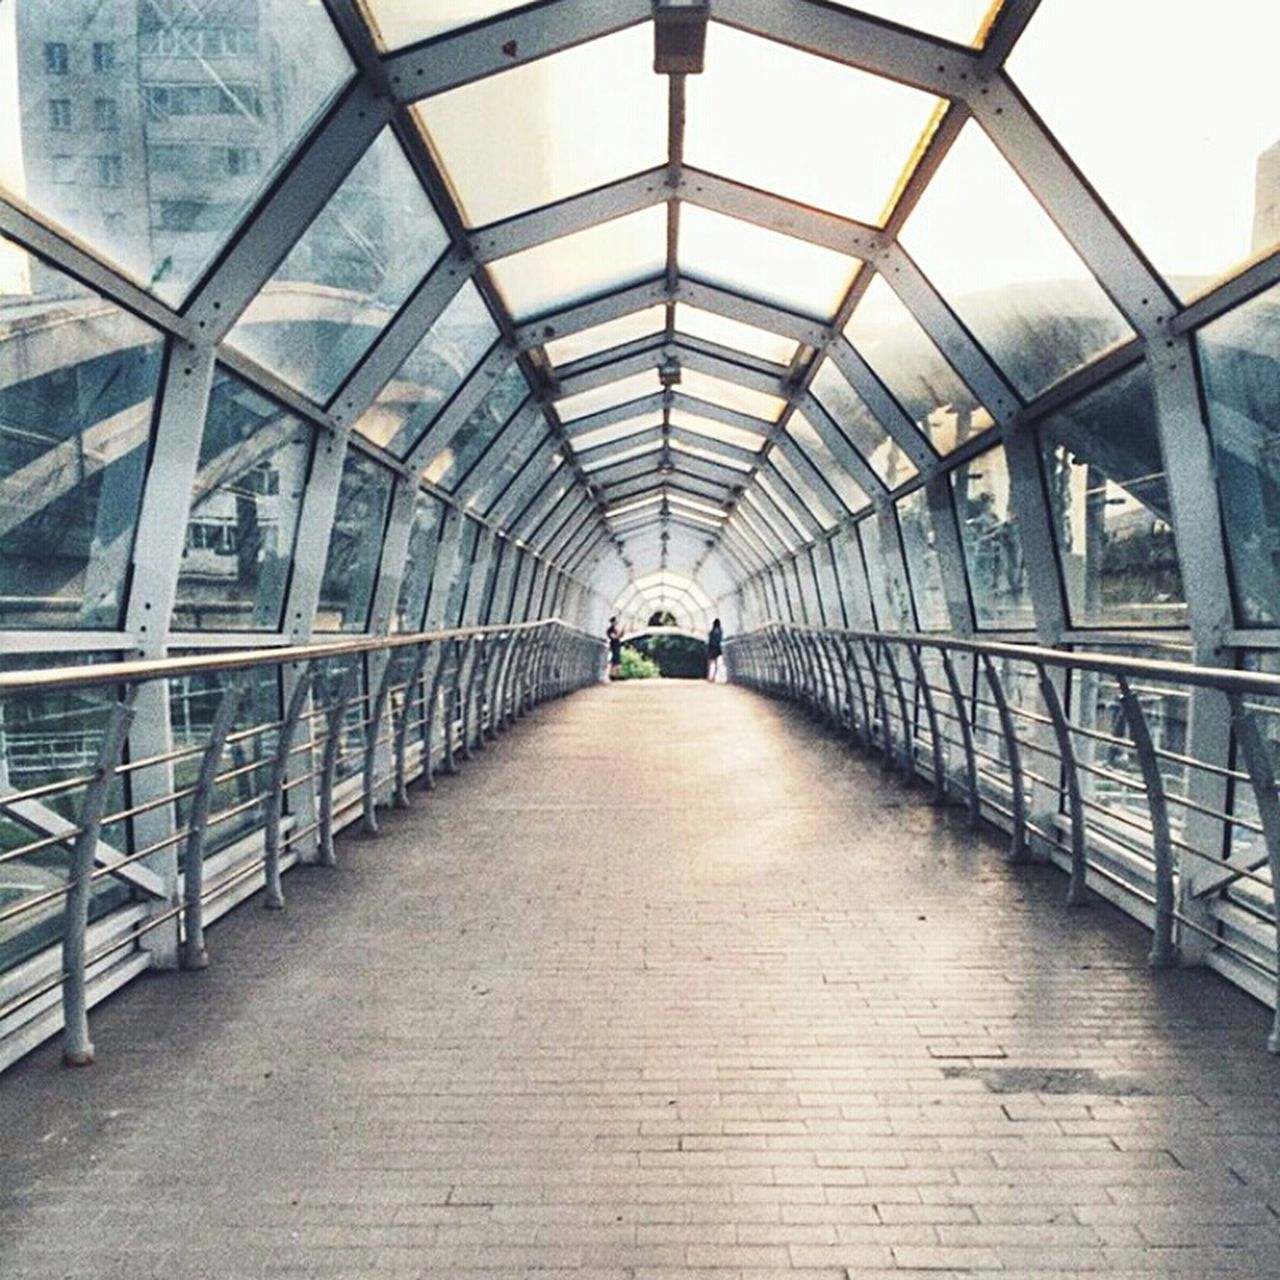 мост переход Architecture Built Structure